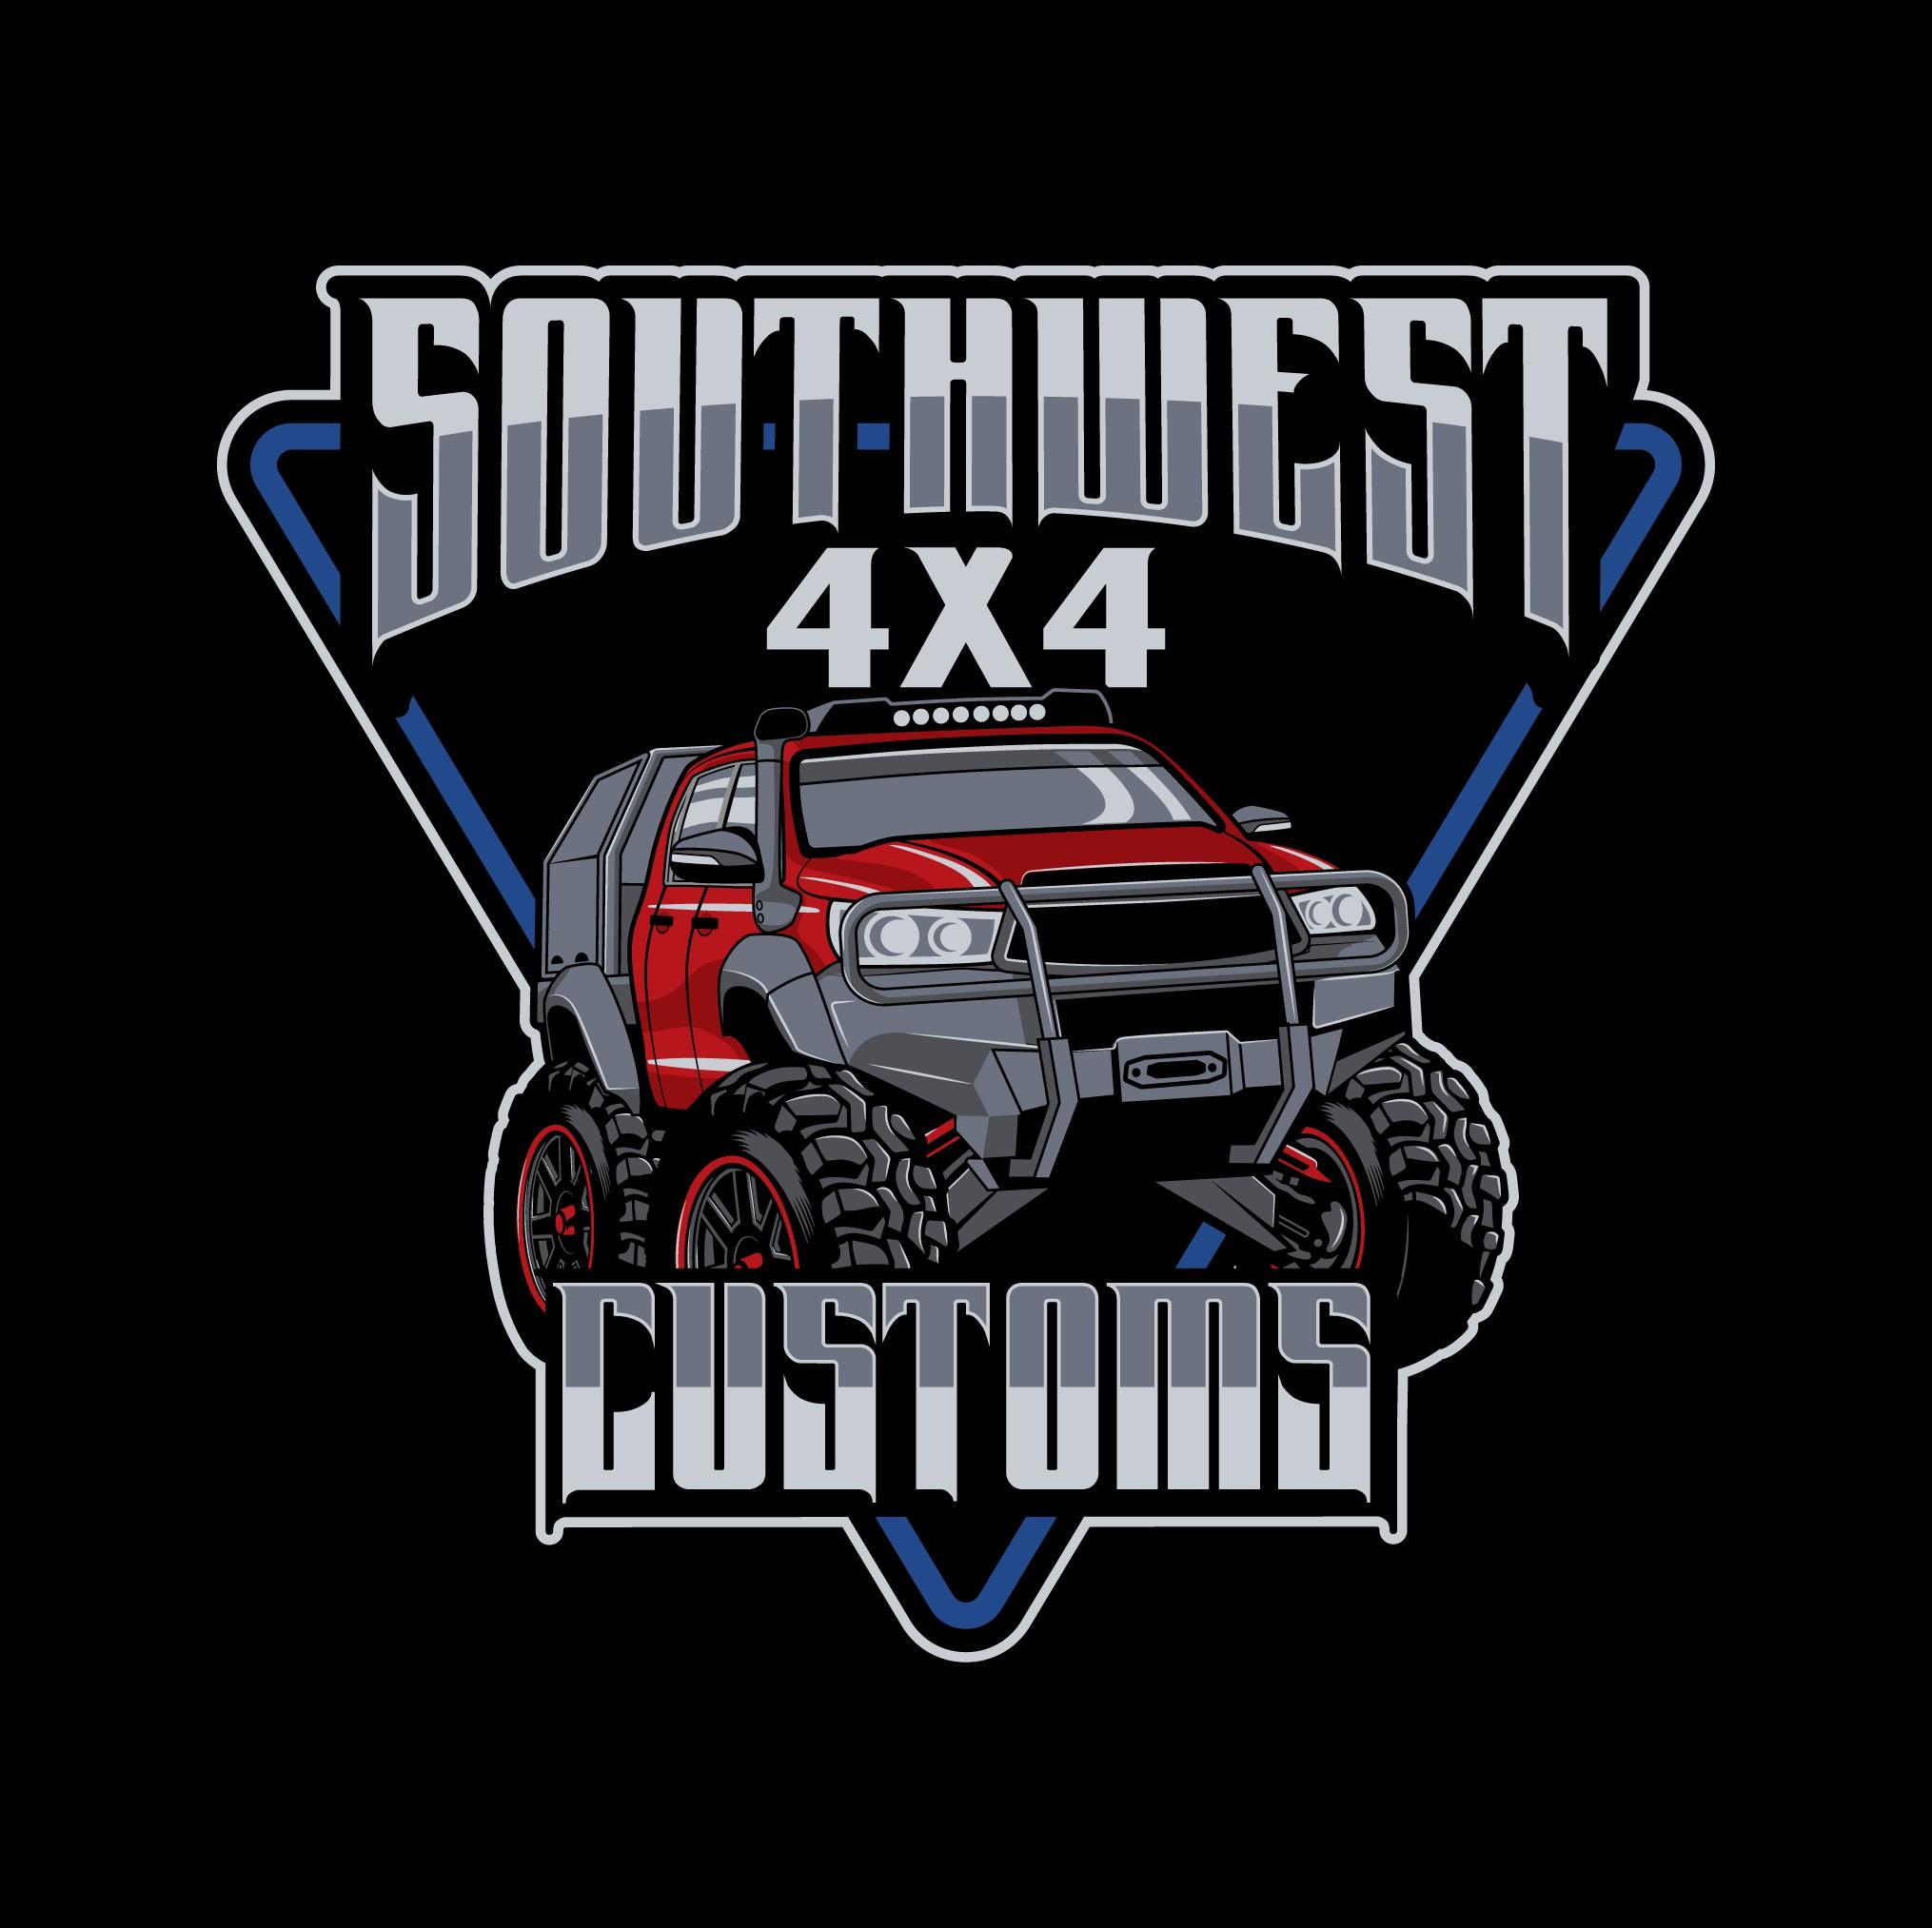 South West 4x4 Customs